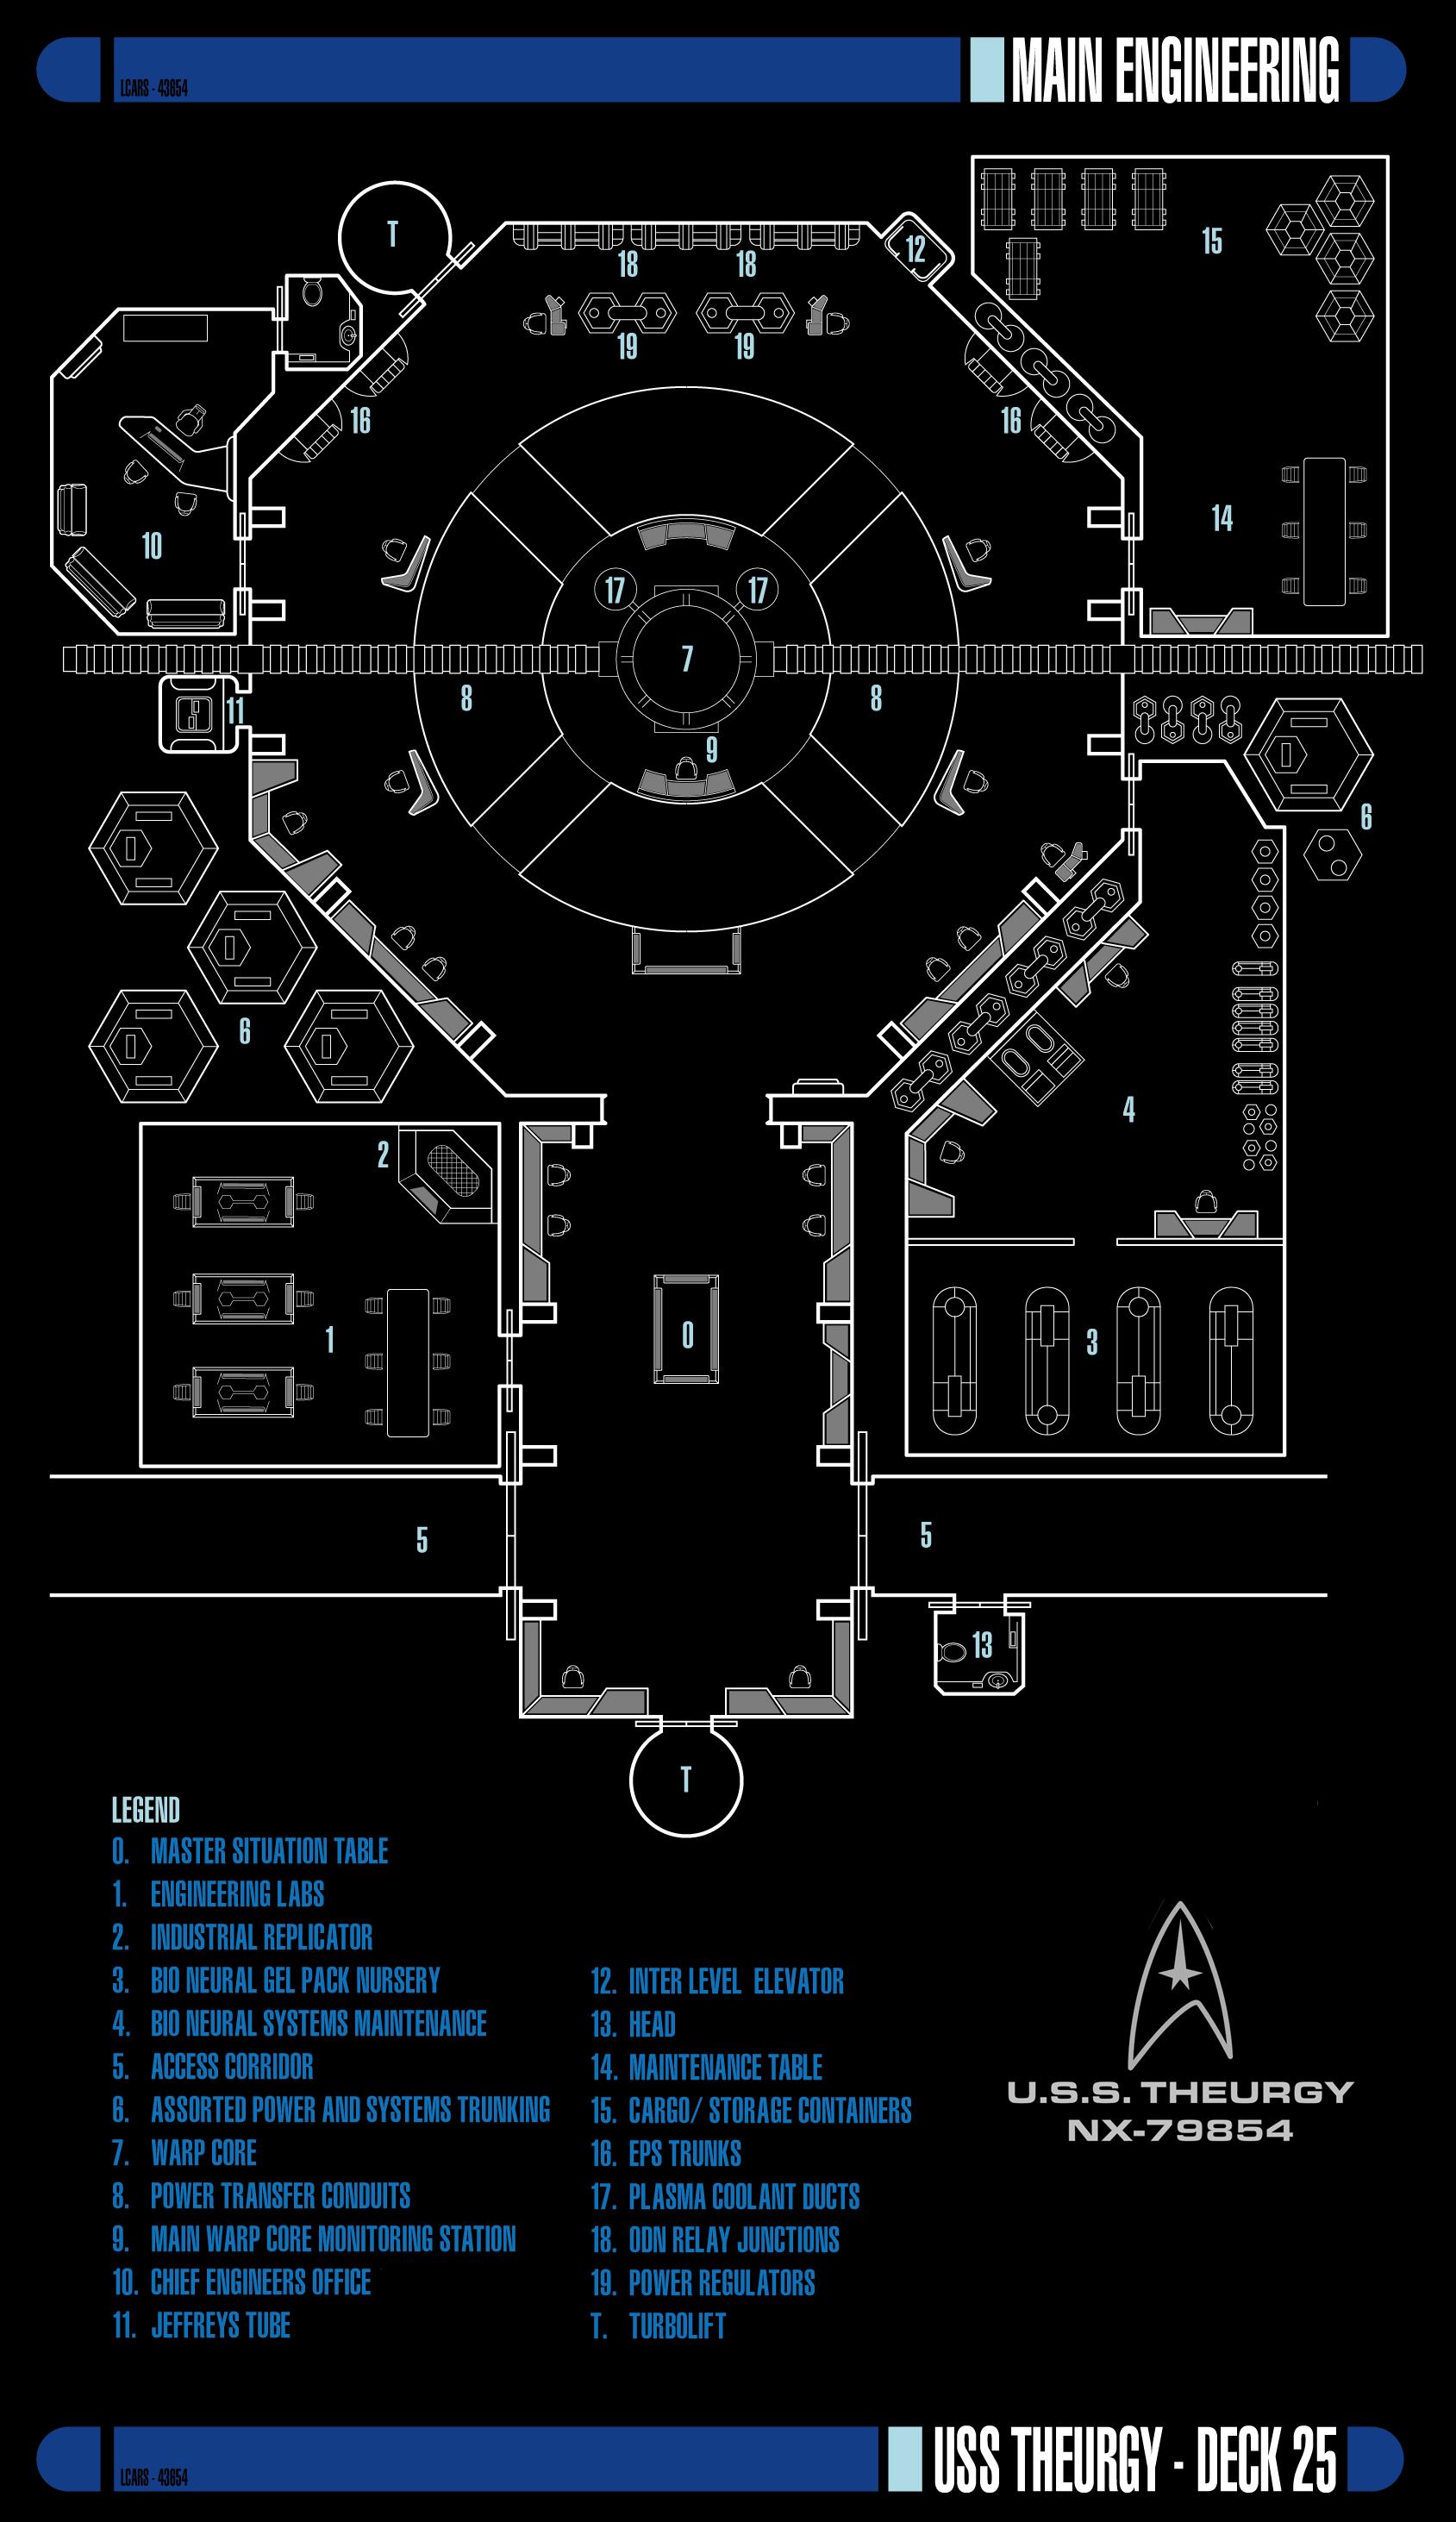 Main Engineering - Deck 25 | USS Theurgy NX-79854